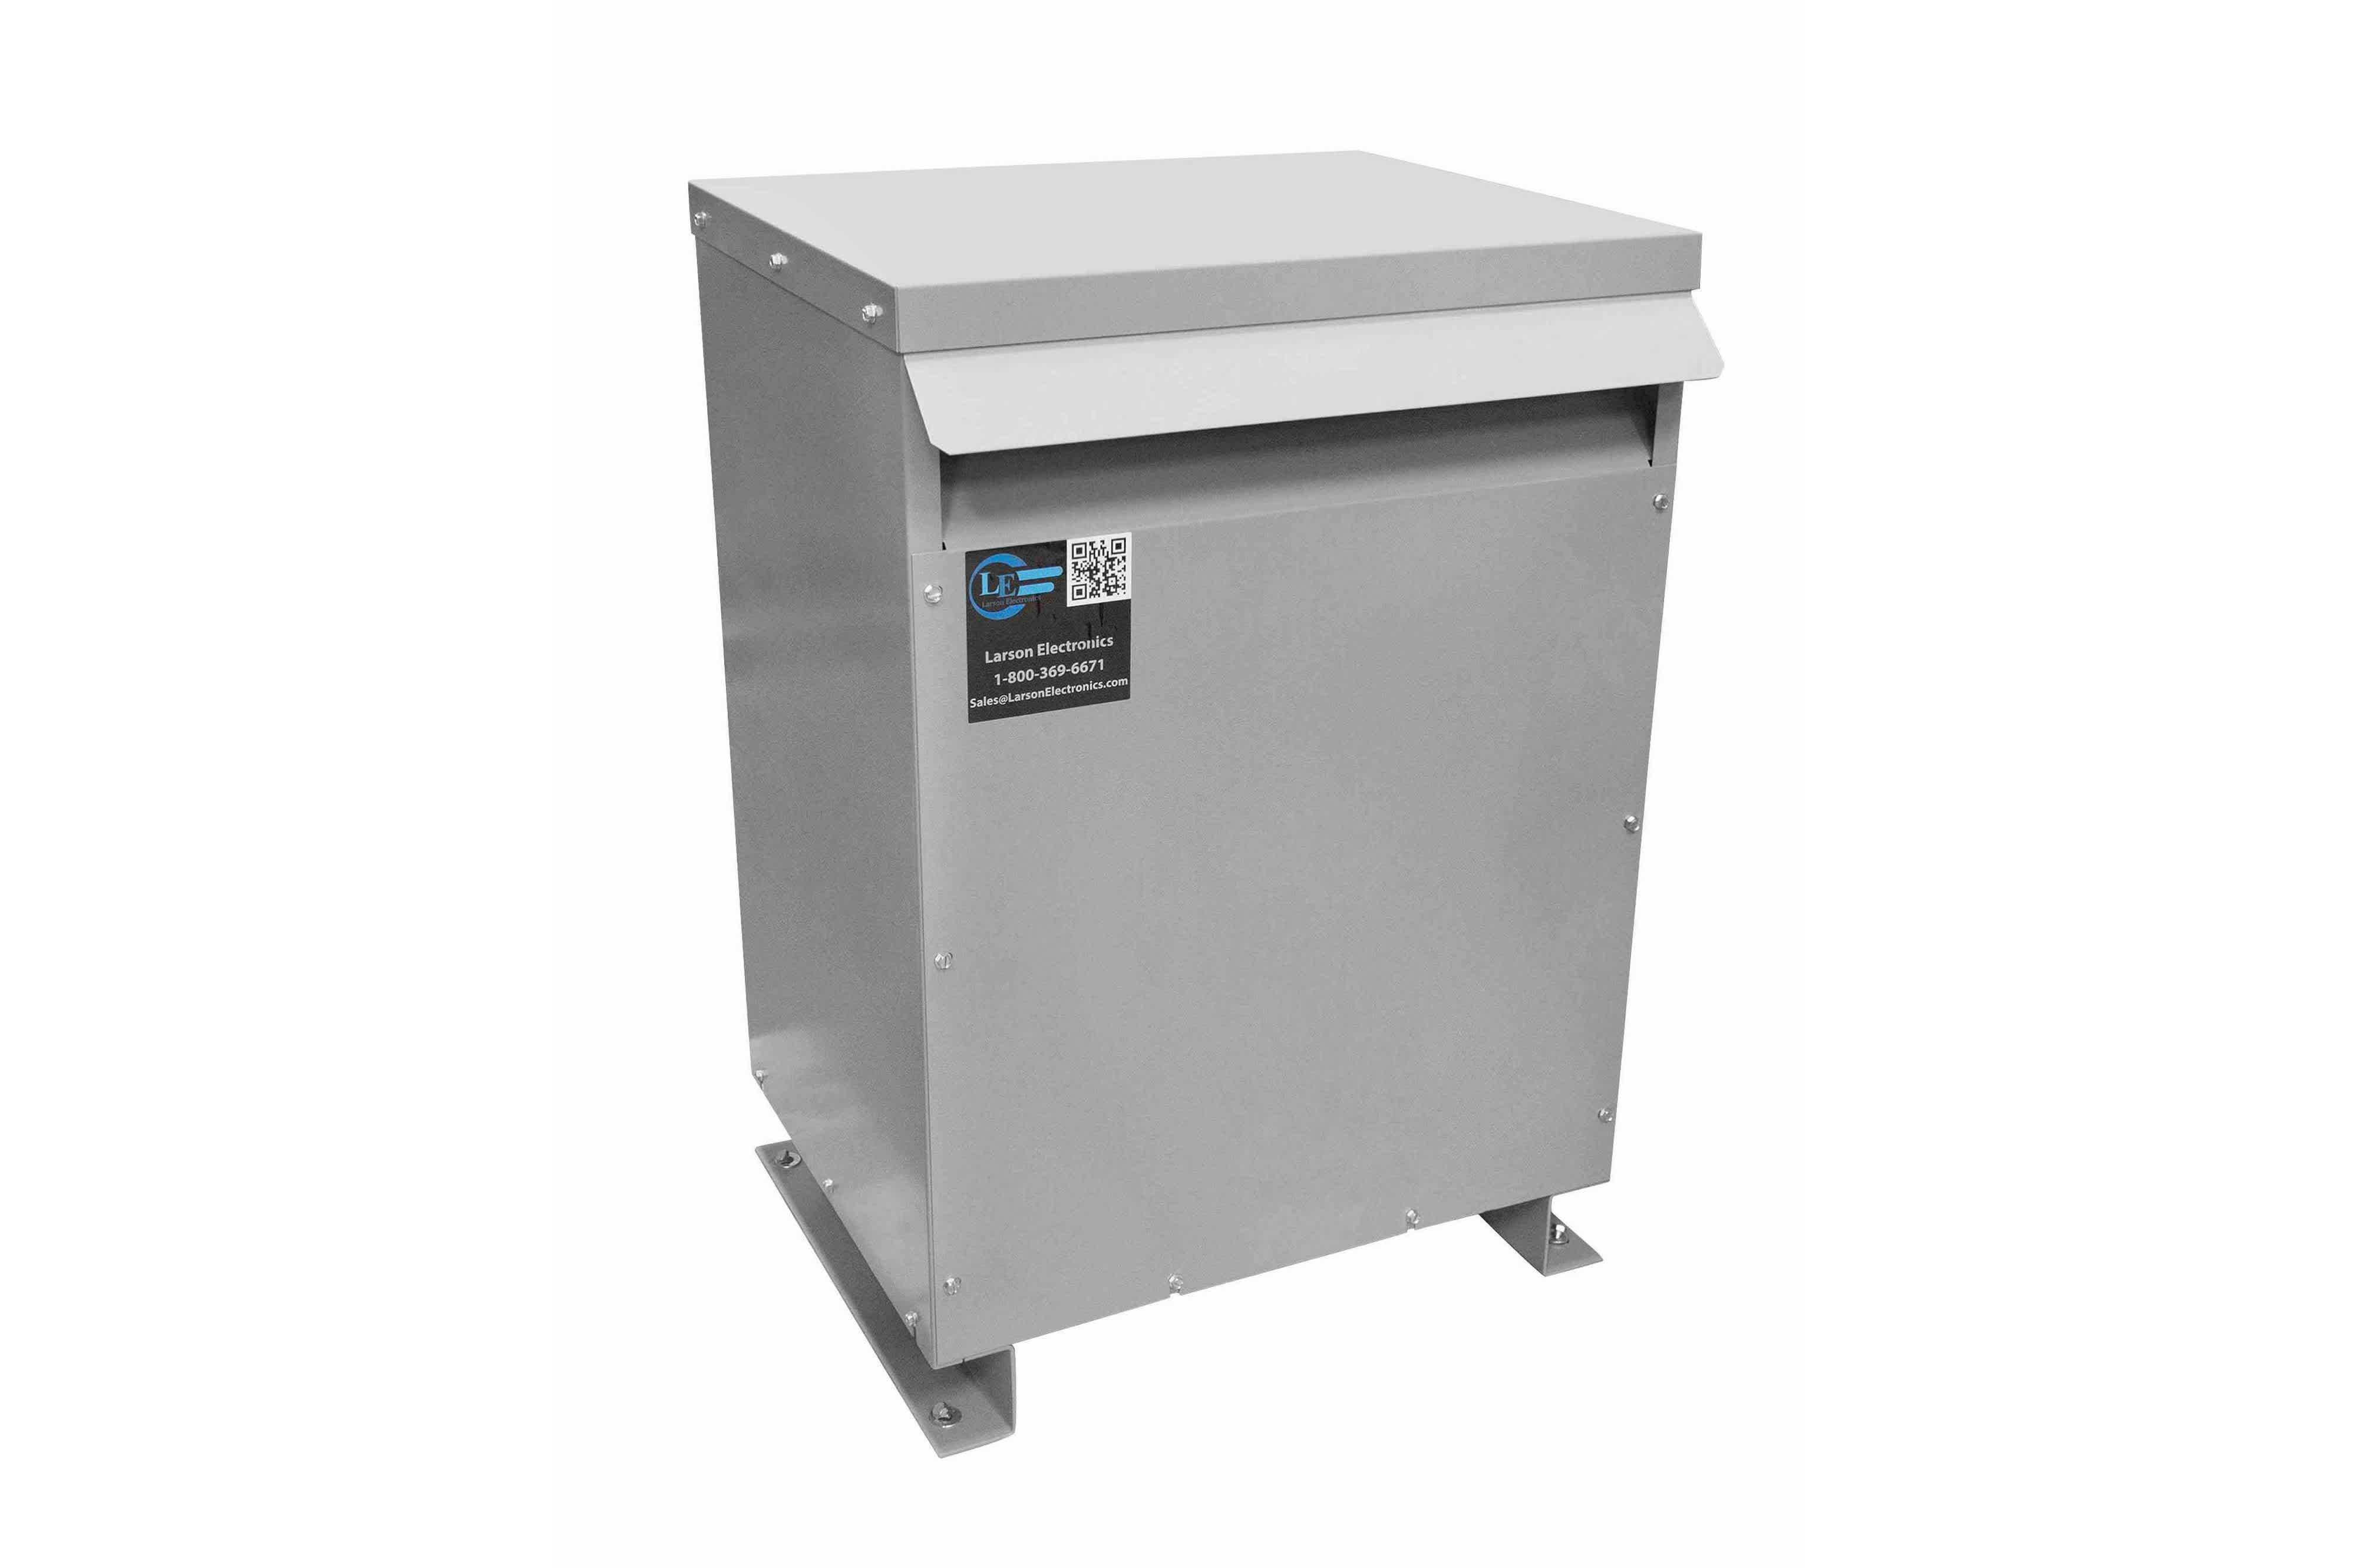 65 kVA 3PH Isolation Transformer, 575V Wye Primary, 415Y/240 Wye-N Secondary, N3R, Ventilated, 60 Hz